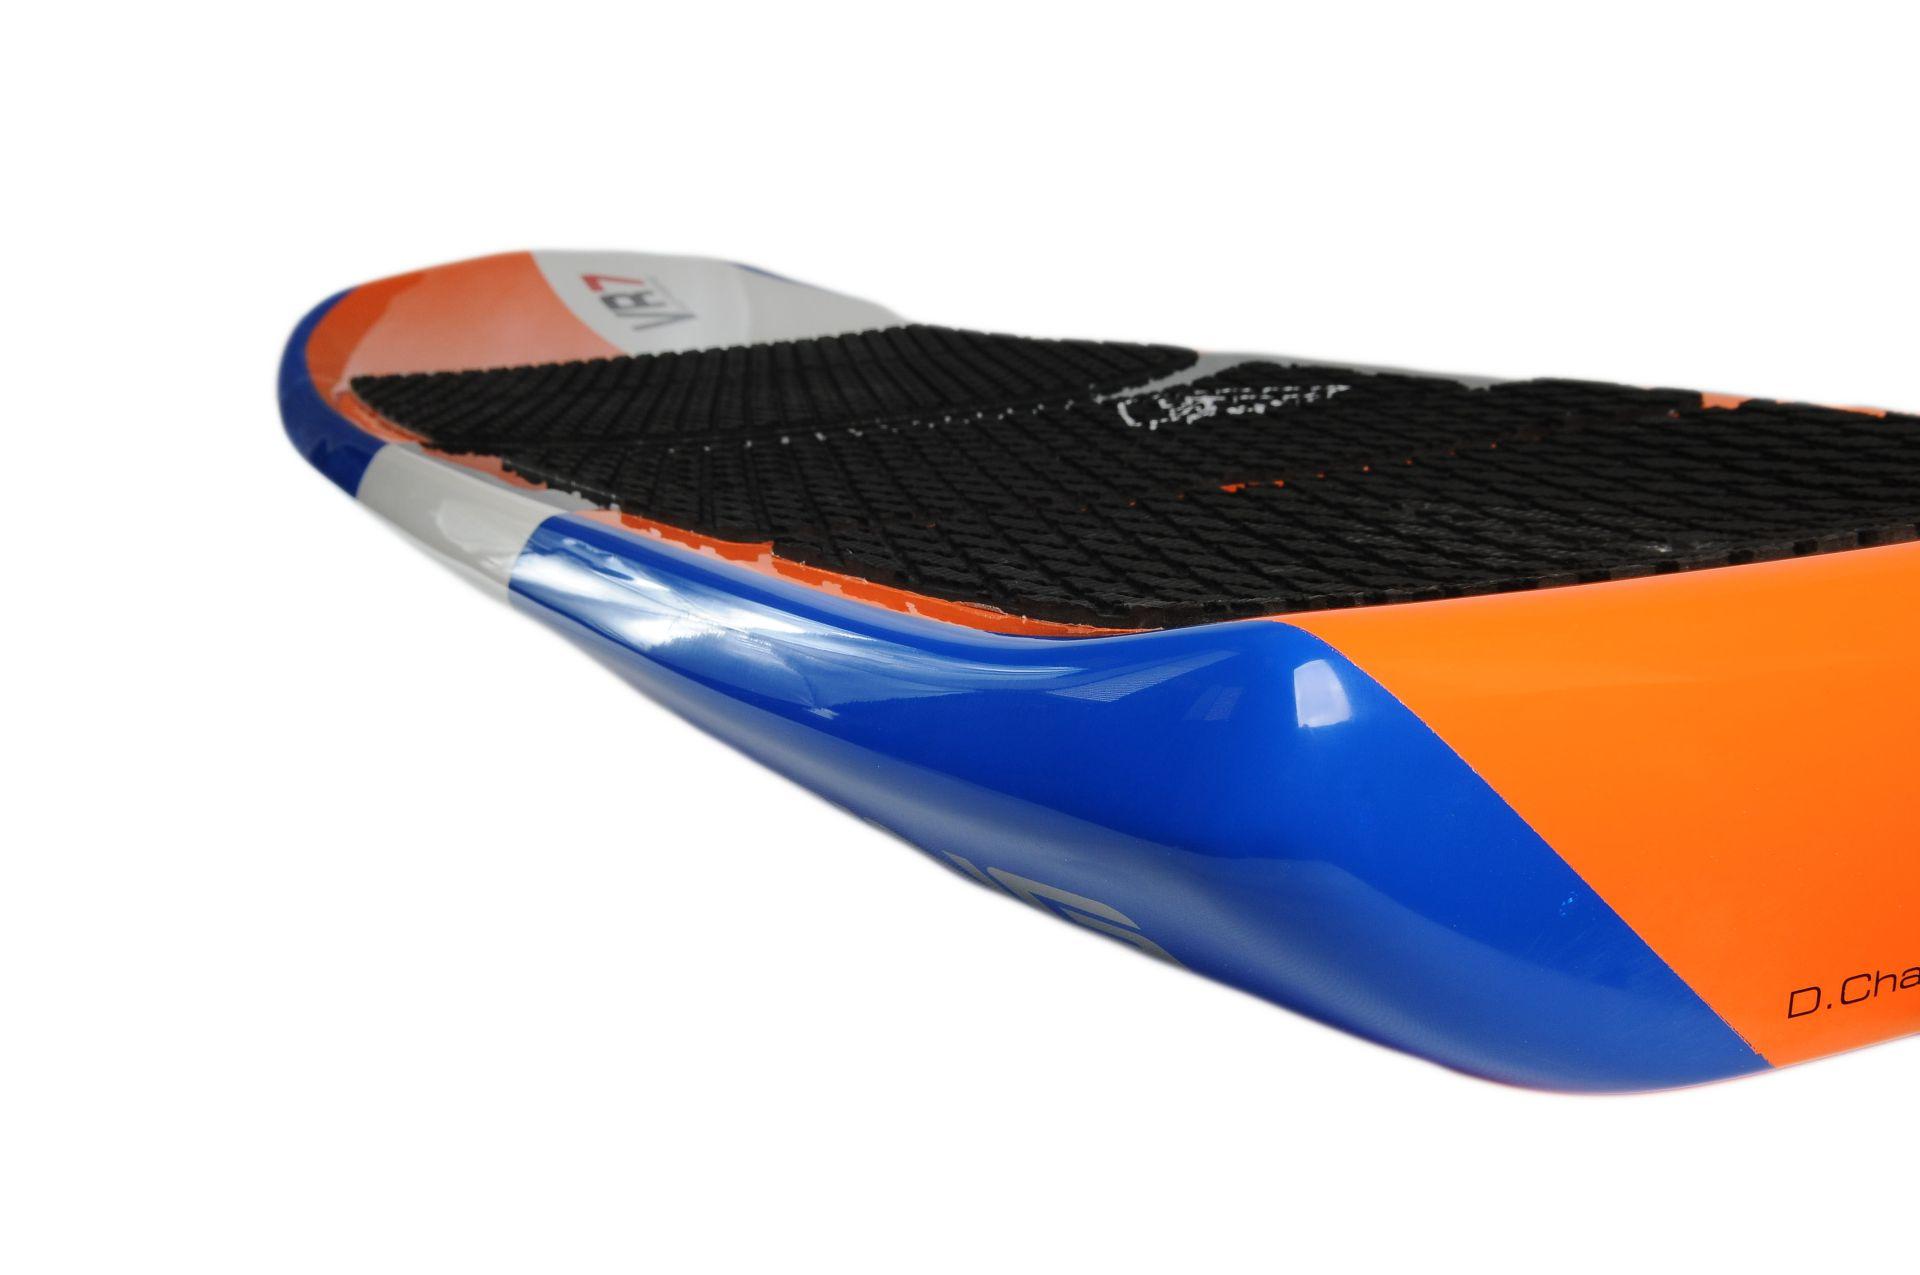 Kitefoil foilboard alpinefoil vr7 1 2